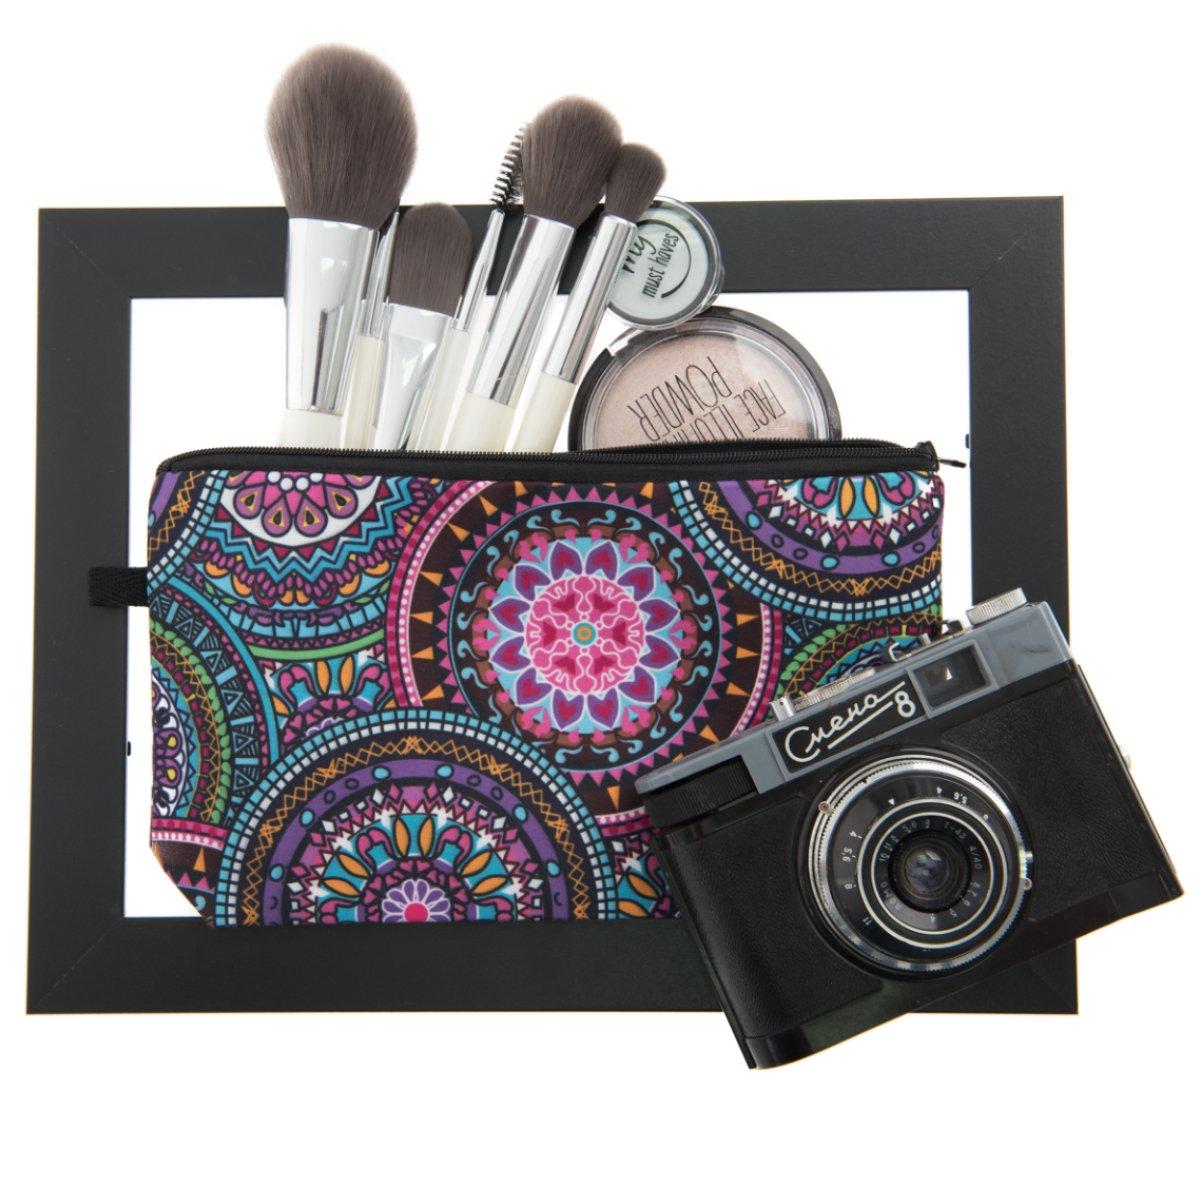 PREMYO Neceser de Maquillaje Estuche Escolar Pochette para Cosméticos Bolsa de Aseo Pequeña Práctico Estampado Impresión Diseño Mandala